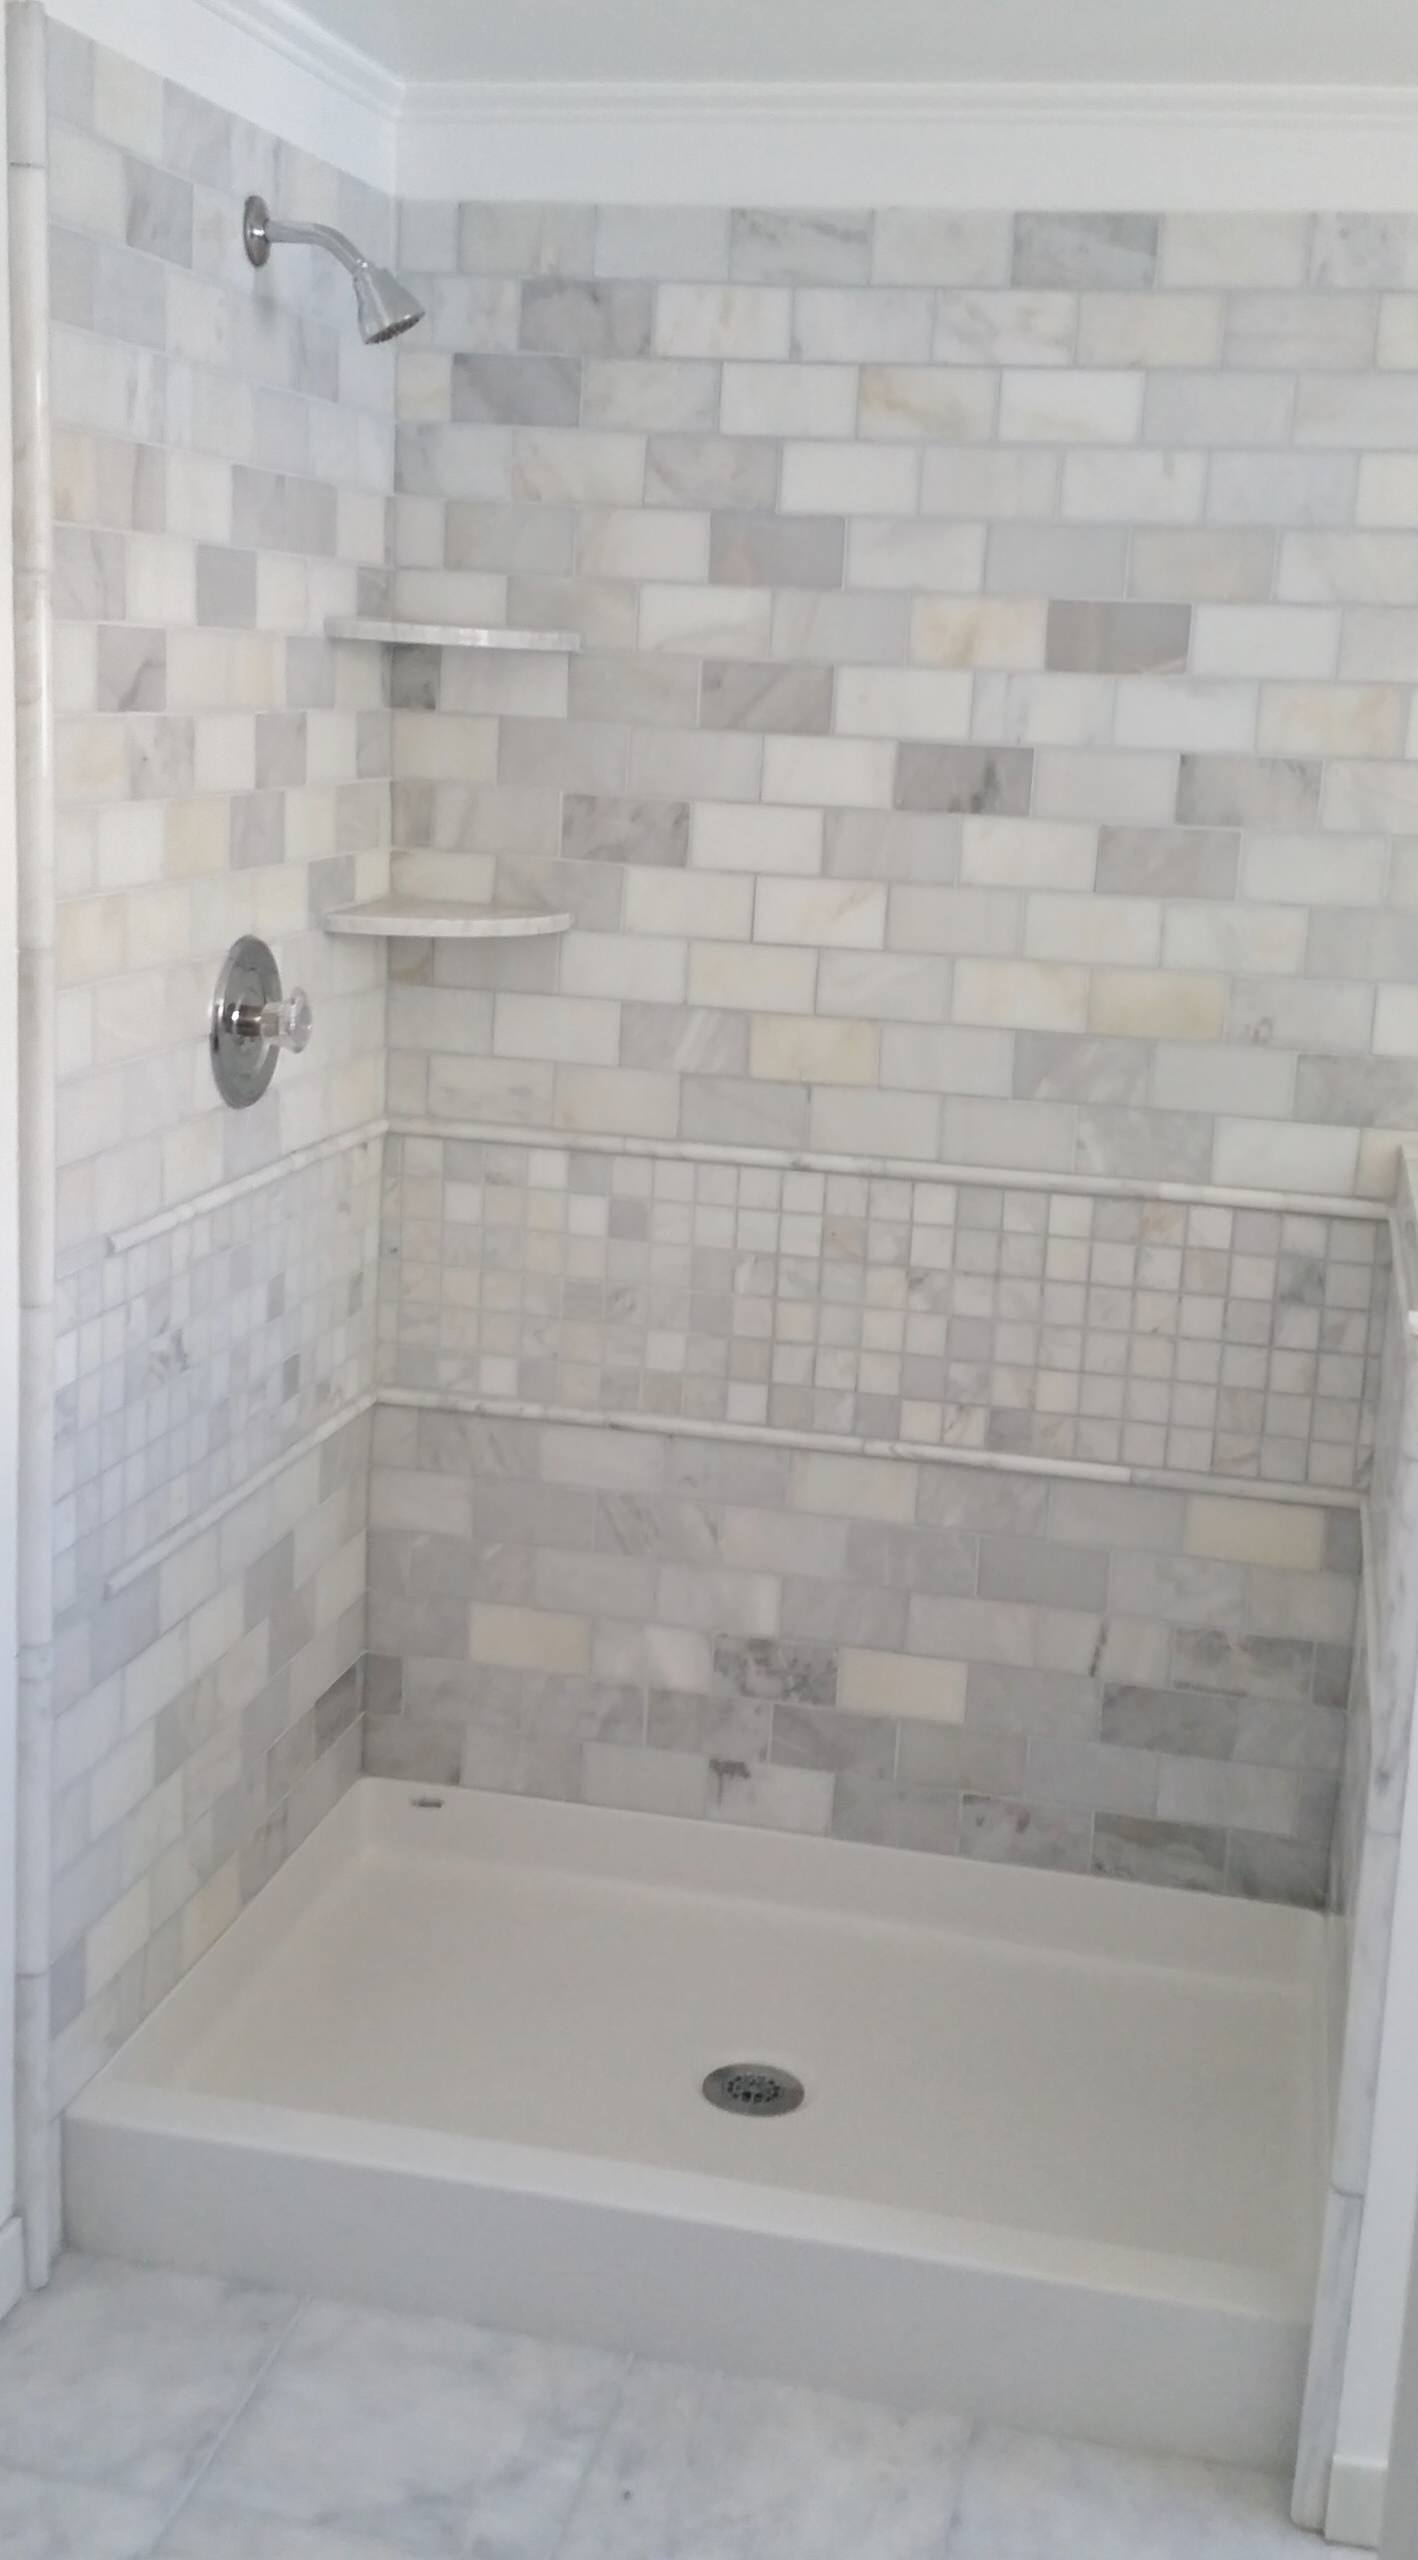 tiled bathtub pictures ideas photos